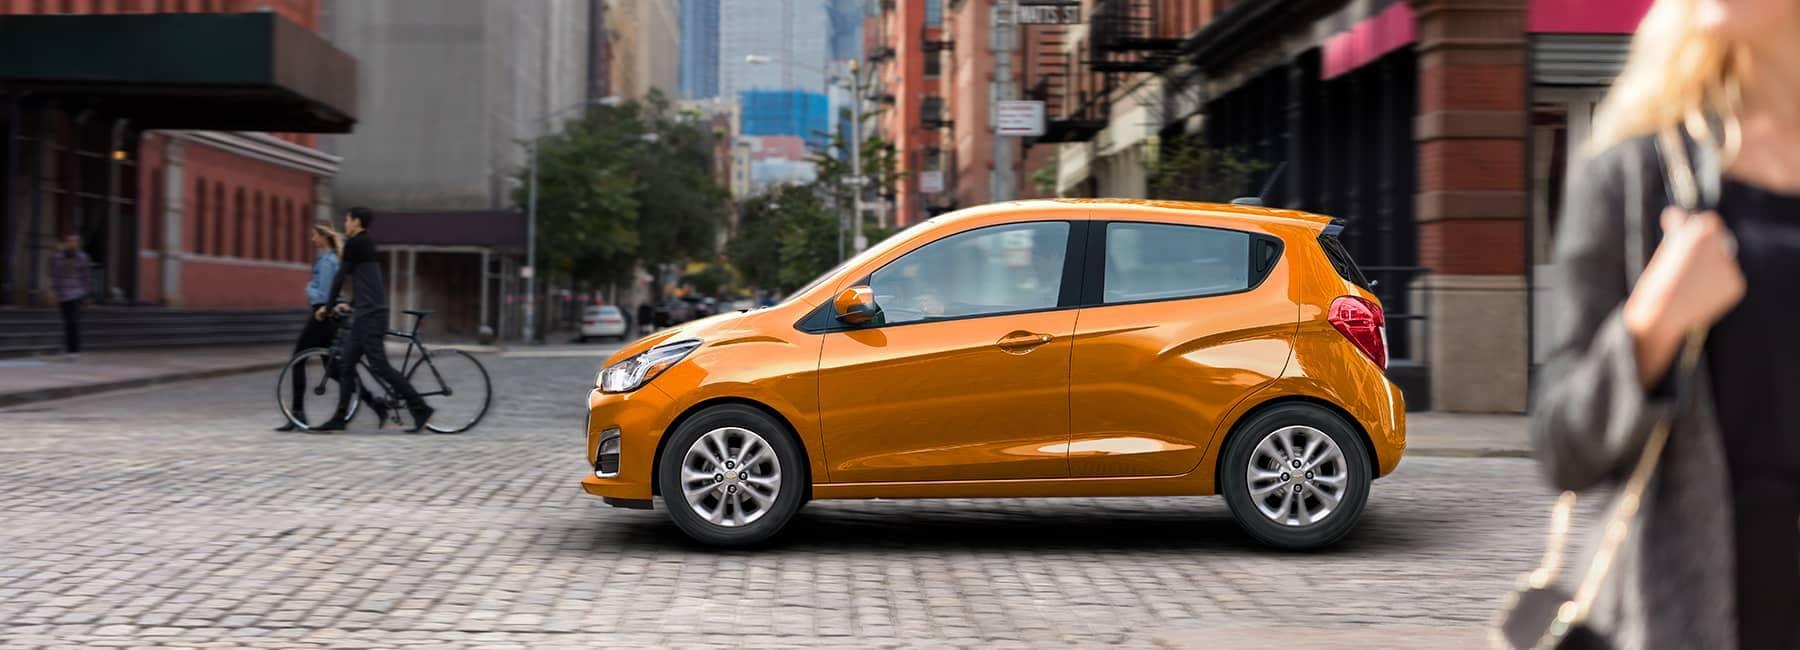 Orange 2020 Chevrolet Spark on a City Street